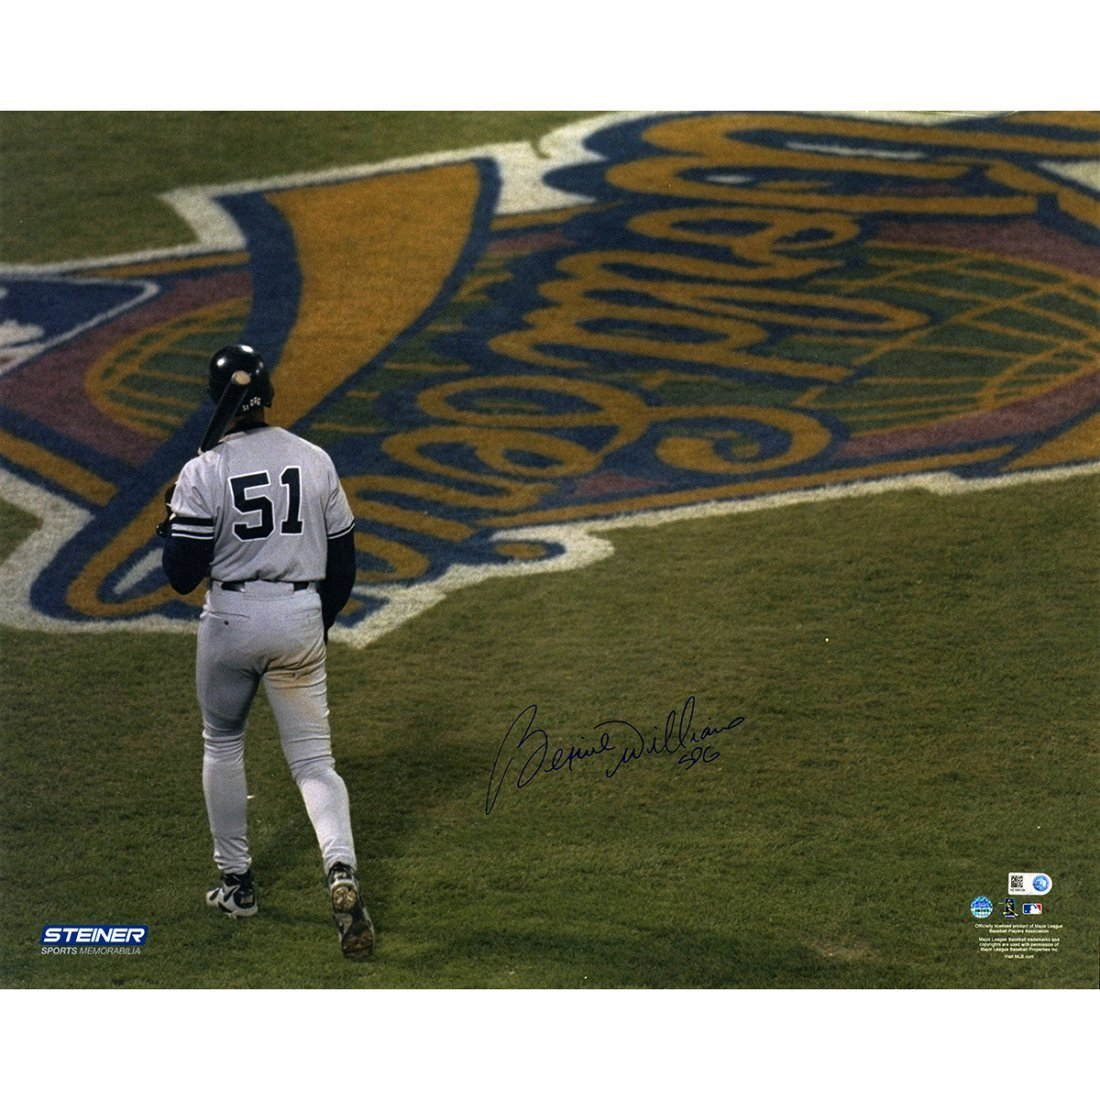 Bernie Williams Signed 1996 16x20 World Series Photo